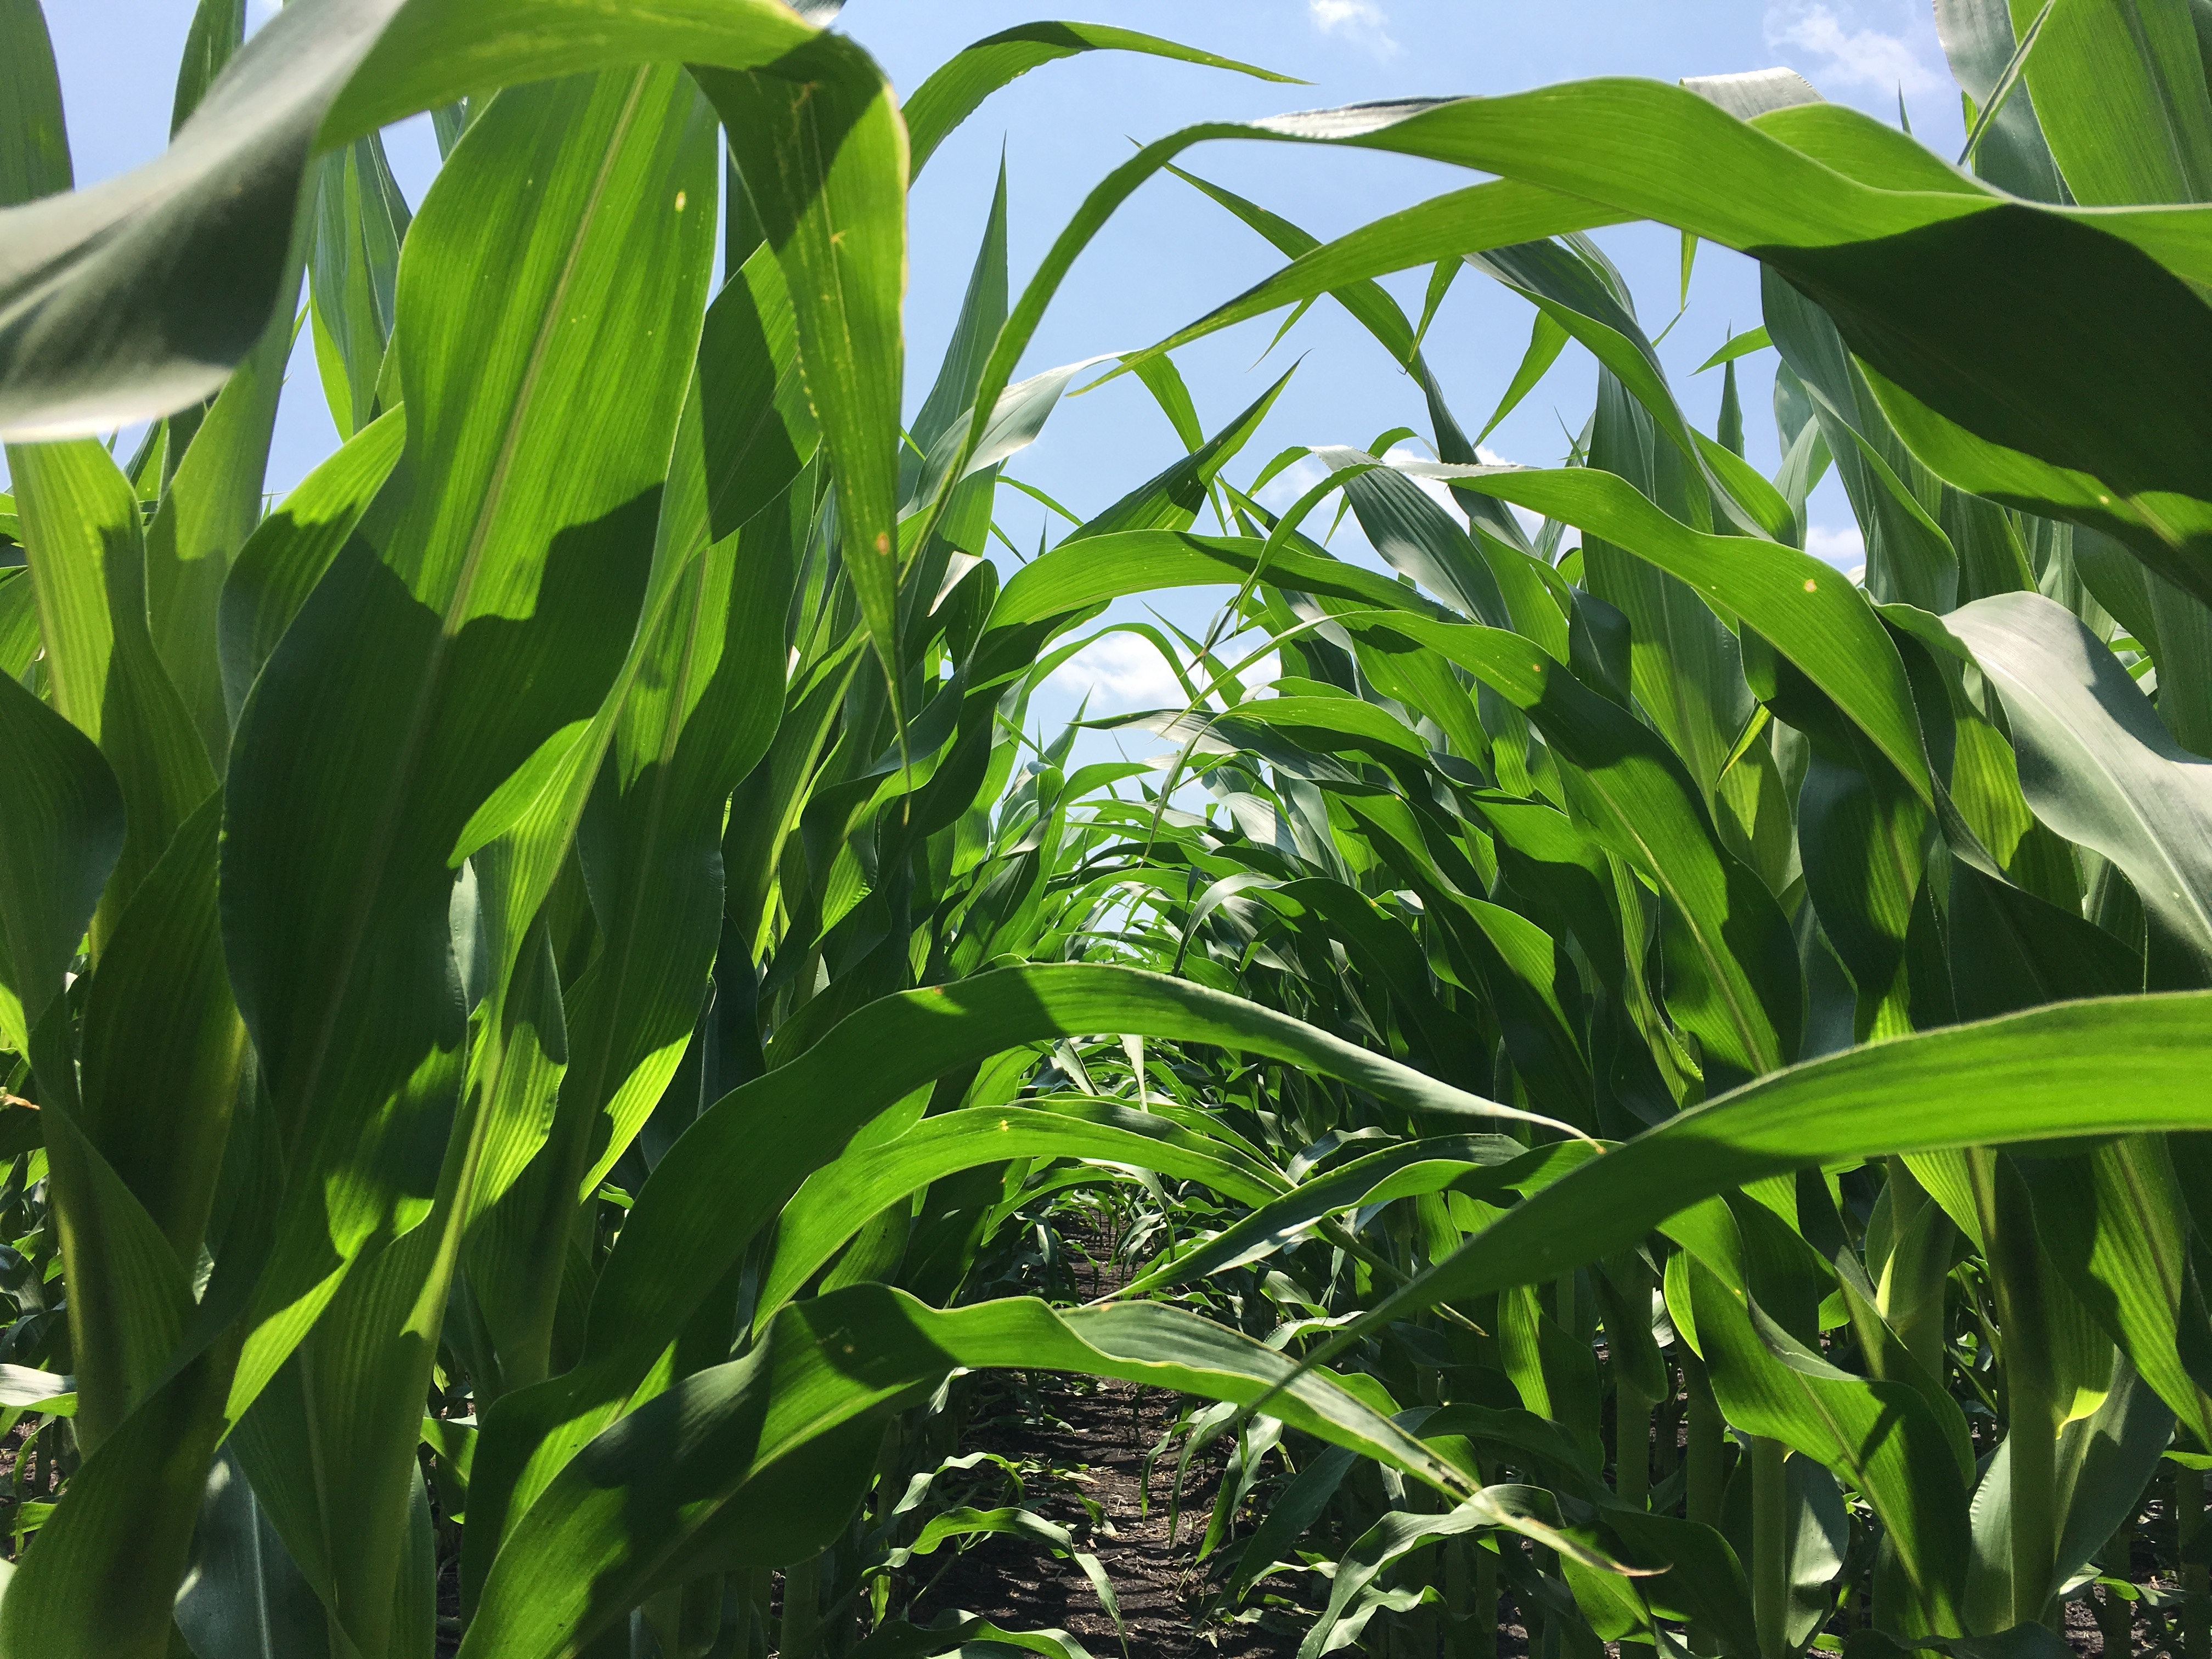 Corn field in northeast North Carolina.